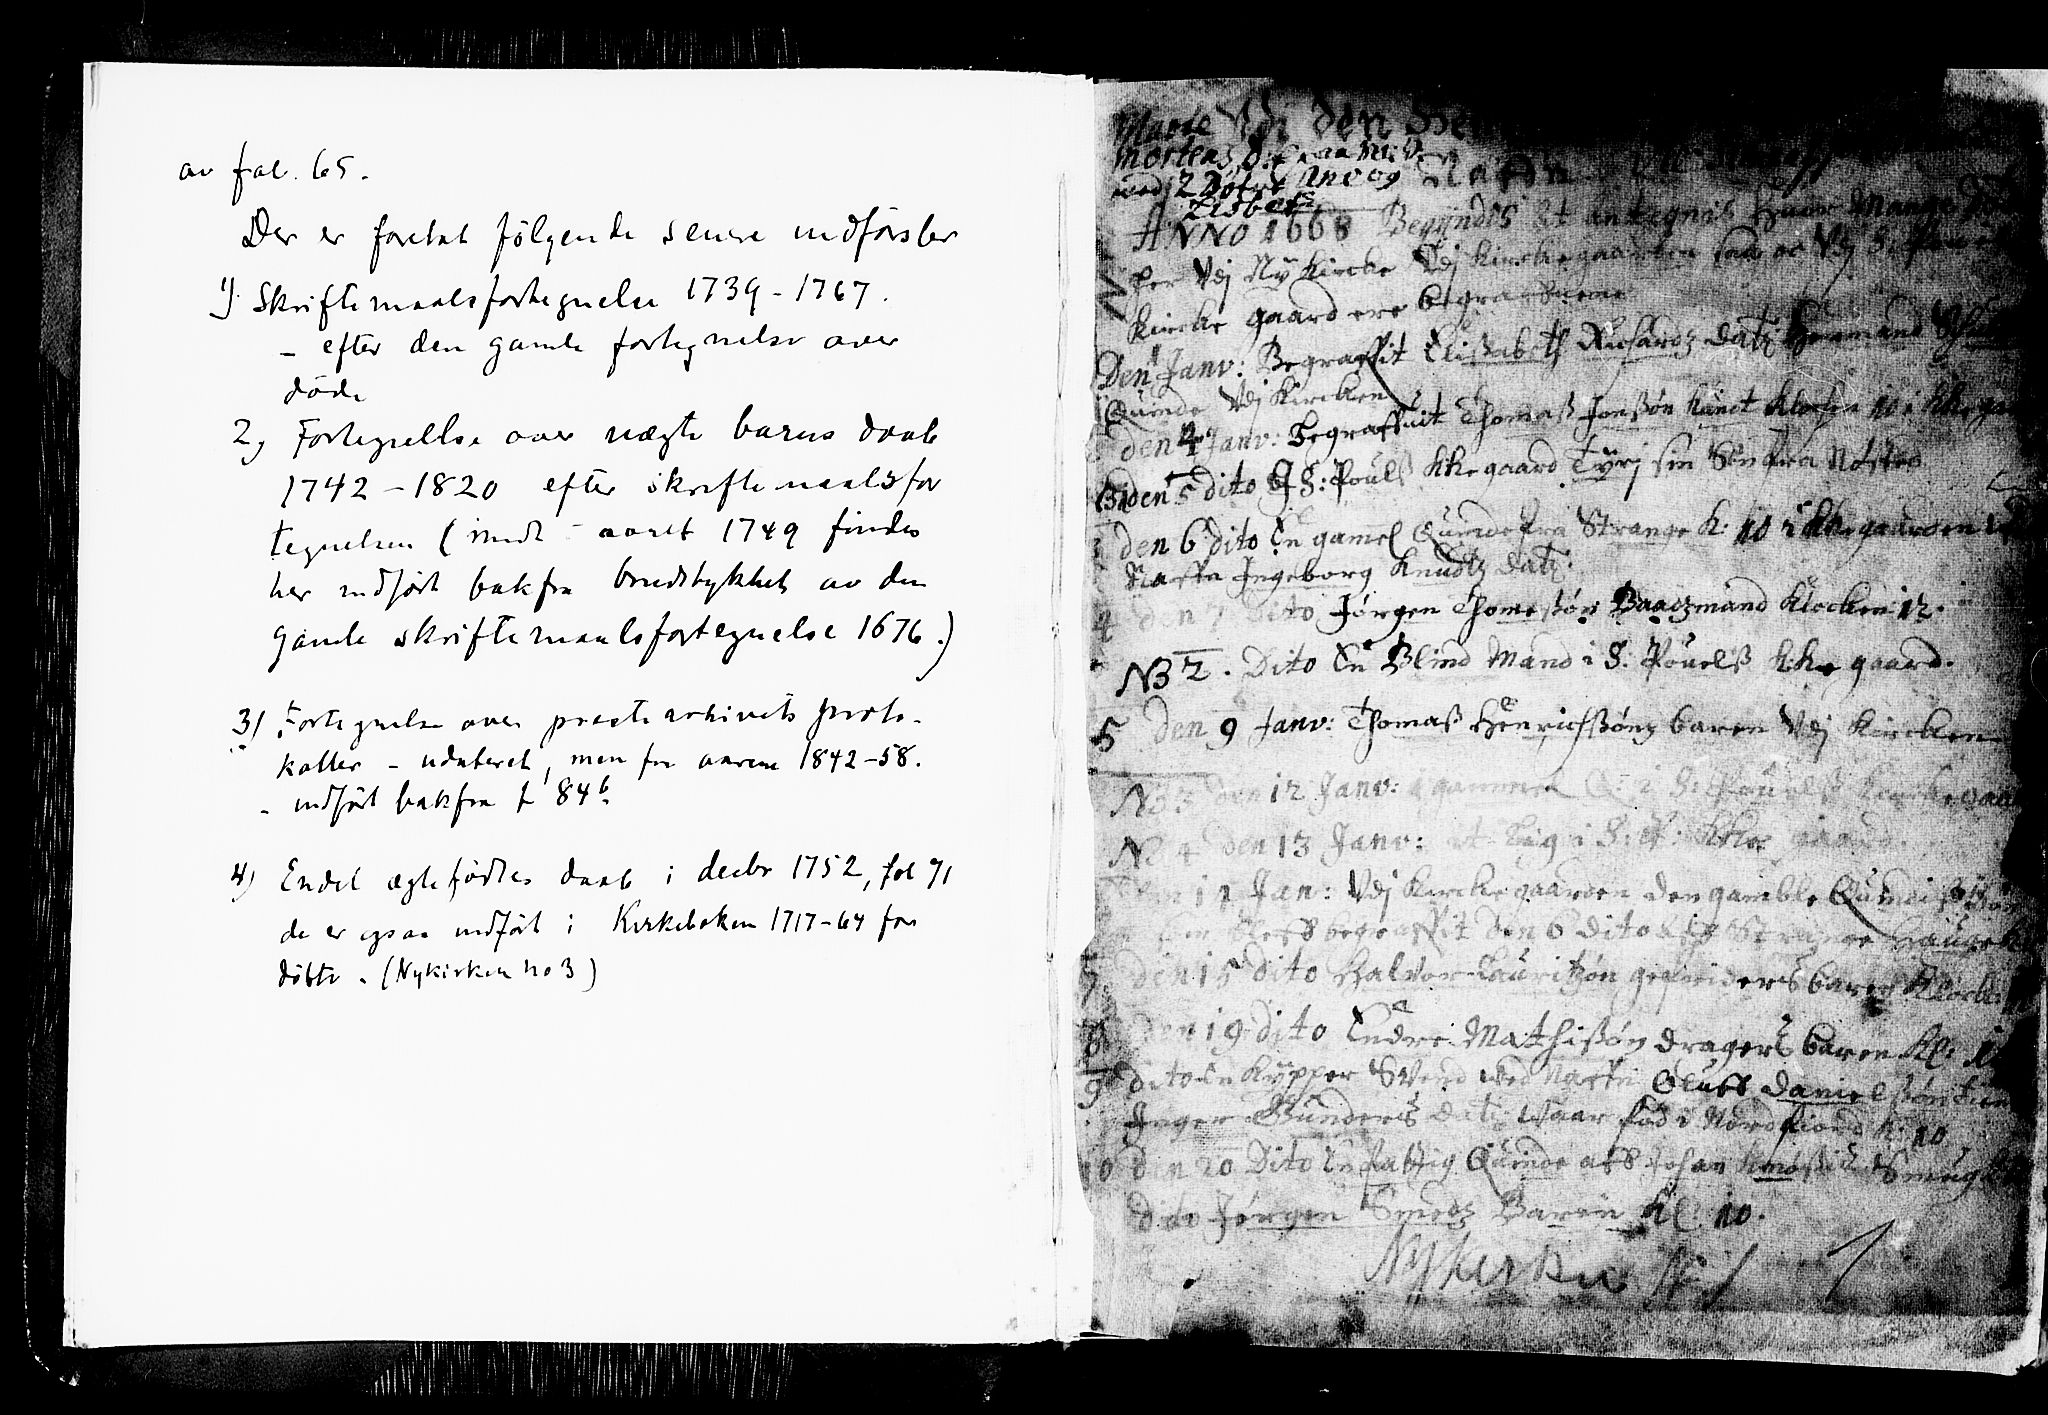 SAB, Nykirken Sokneprestembete, H/Haa: Ministerialbok nr. A 1, 1668-1820, s. 1